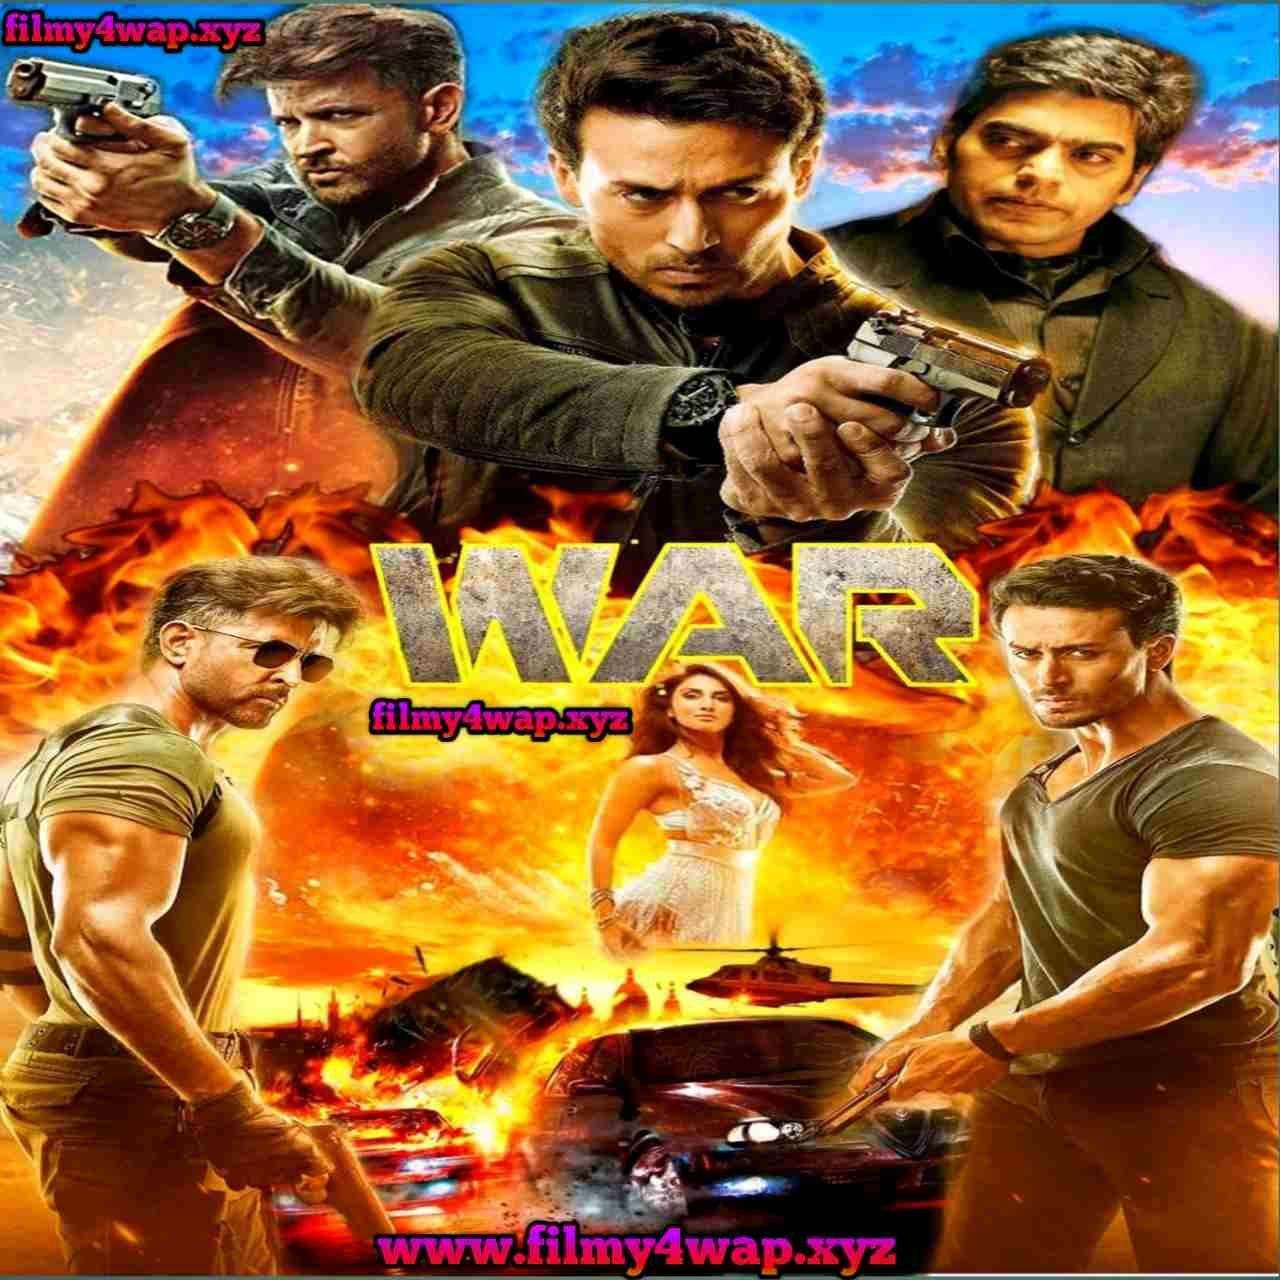 war,war 2019,war movie,war movie poster,war movir hd